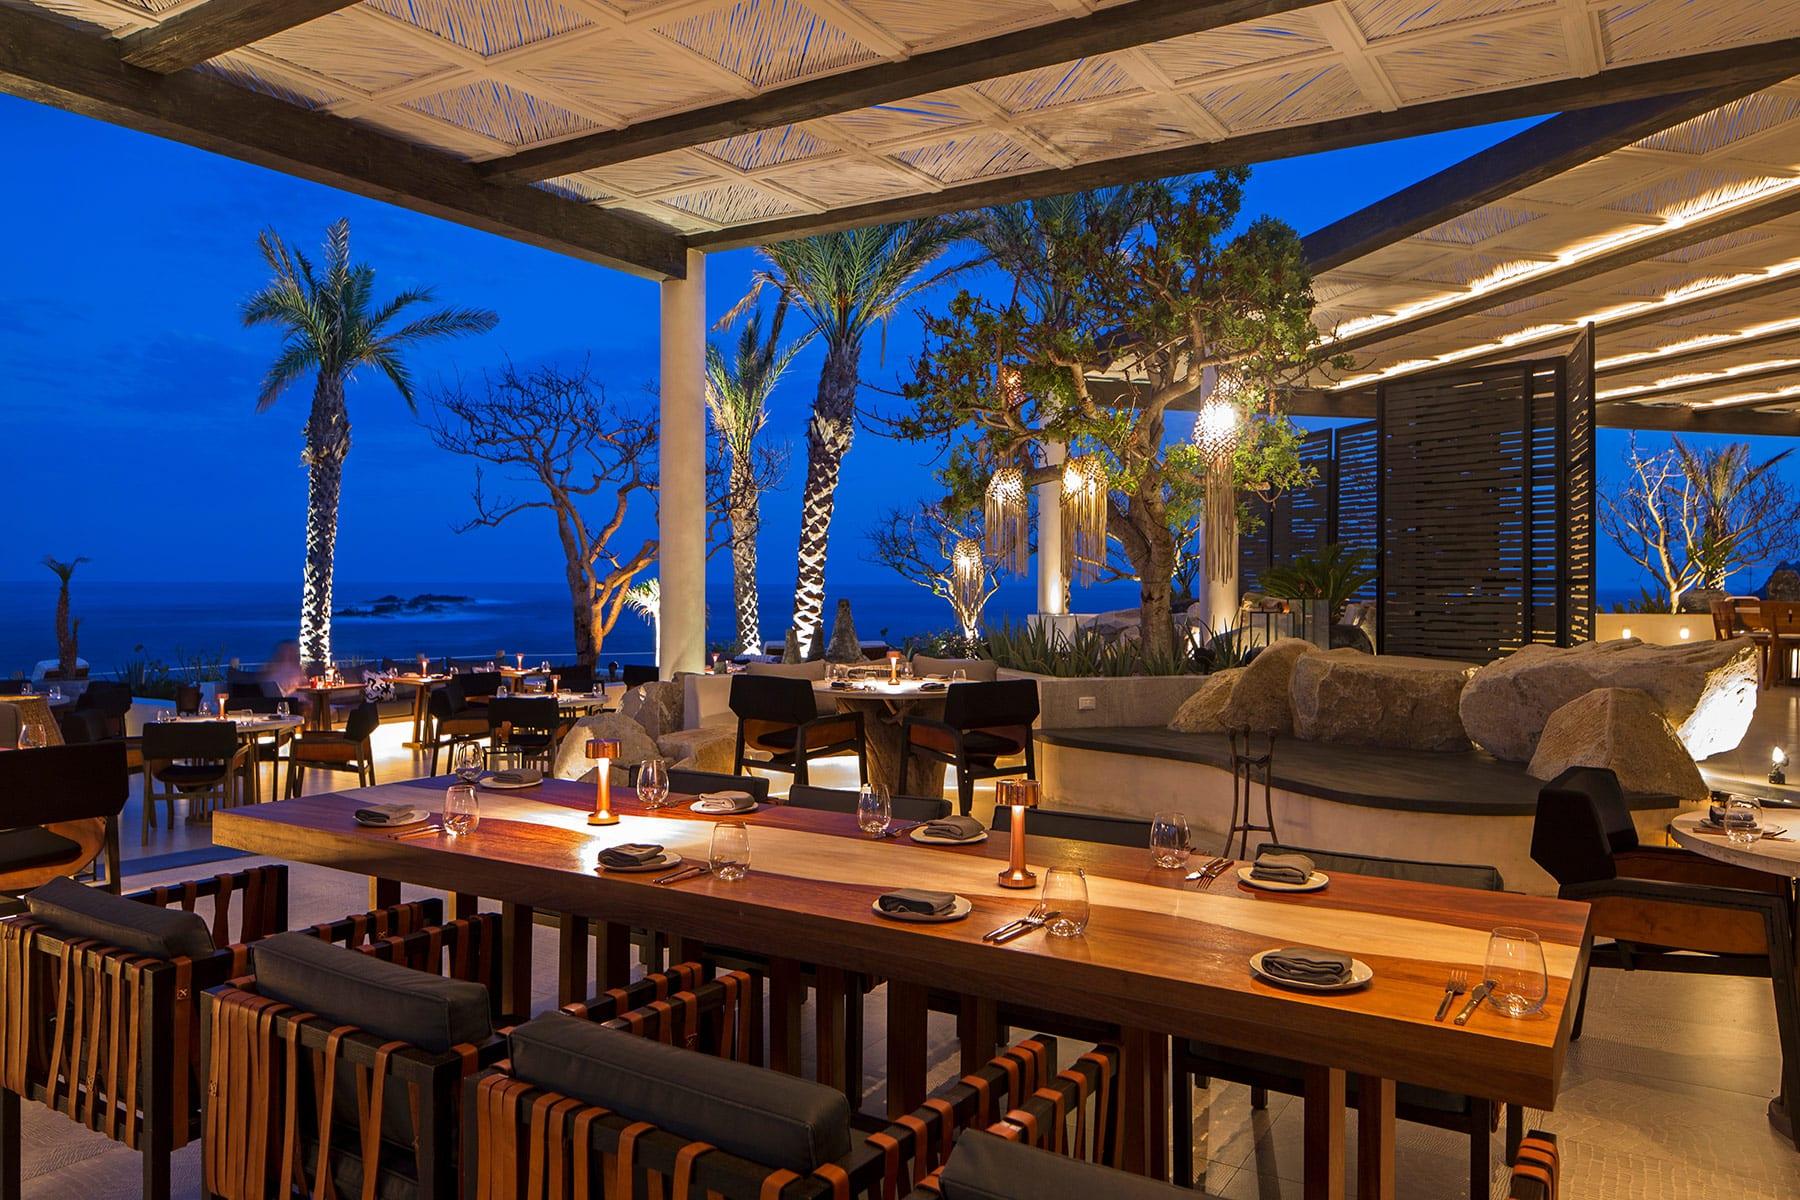 comal-cabo-restaurant-night.jpg